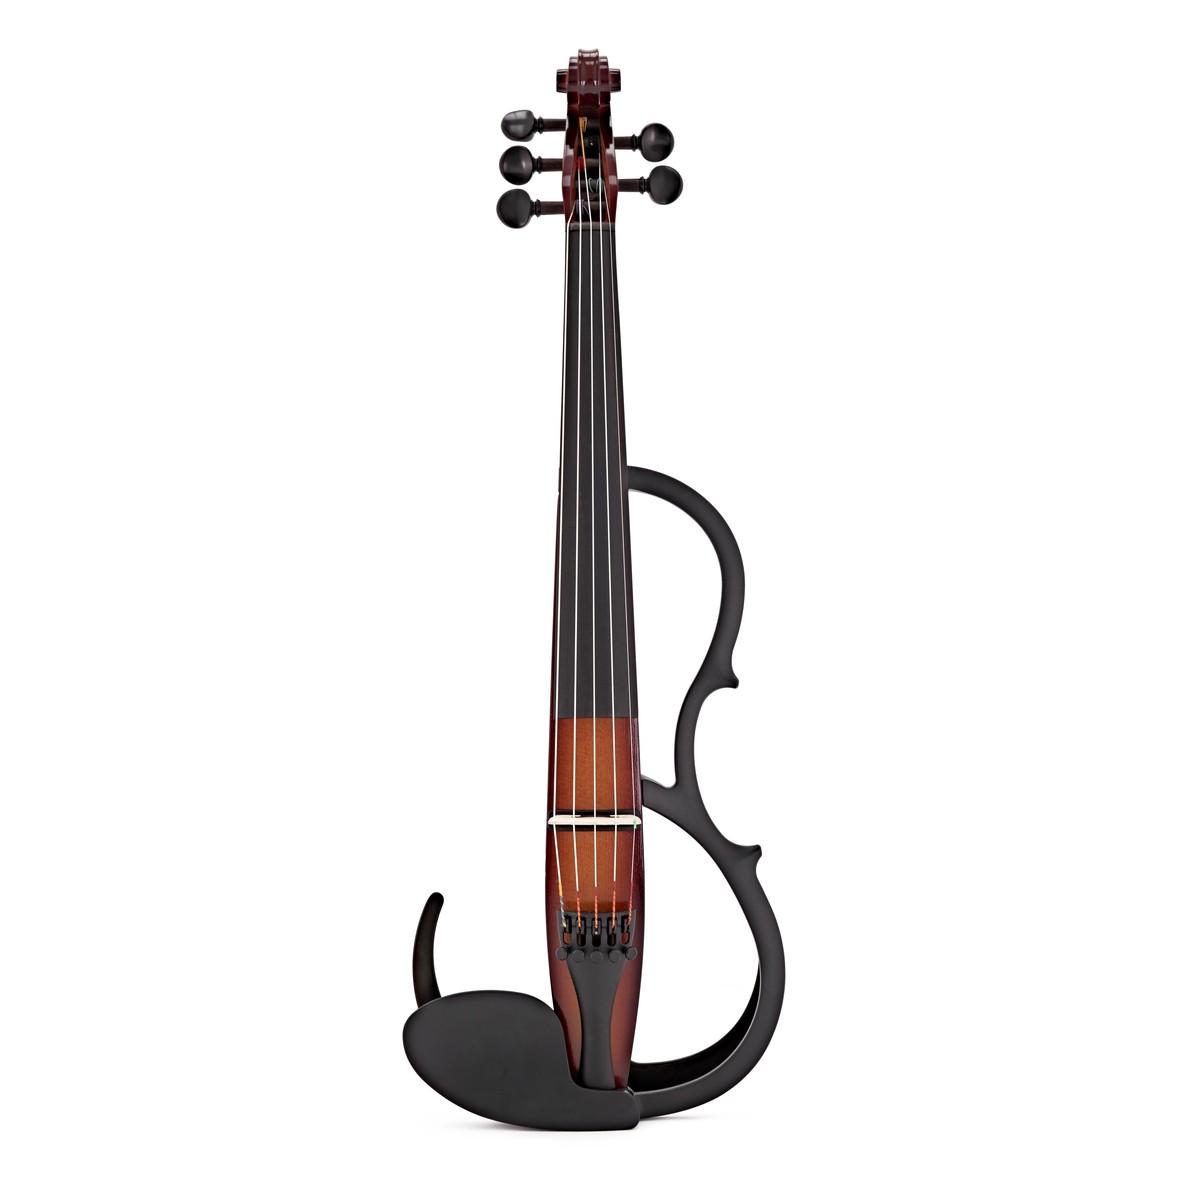 Yamaha SV255 Silent Violin, Brown at Gear4music